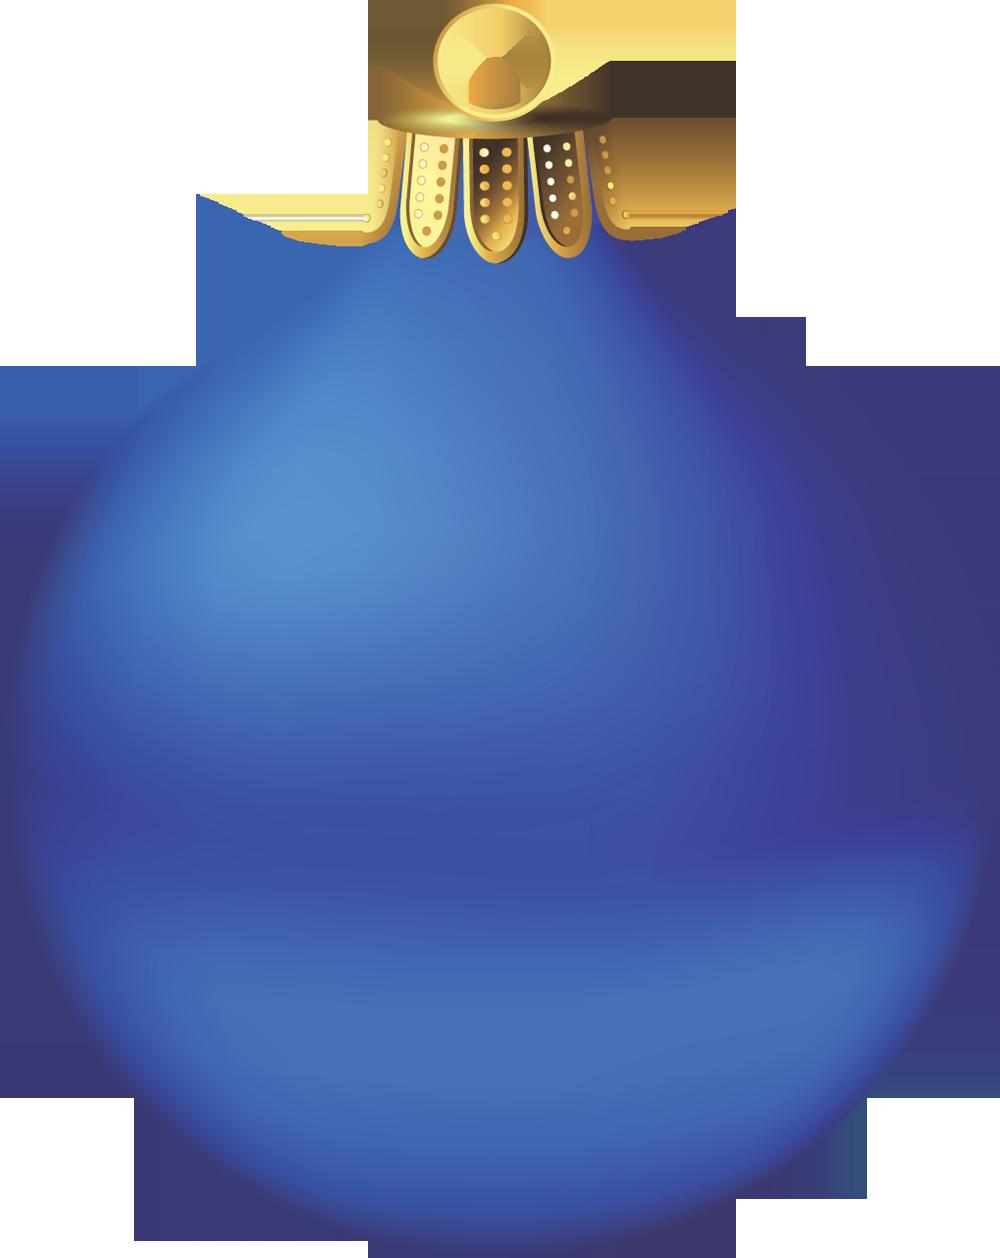 Christmas Ornament Clipart | Clipart Panda - Free Clipart ...